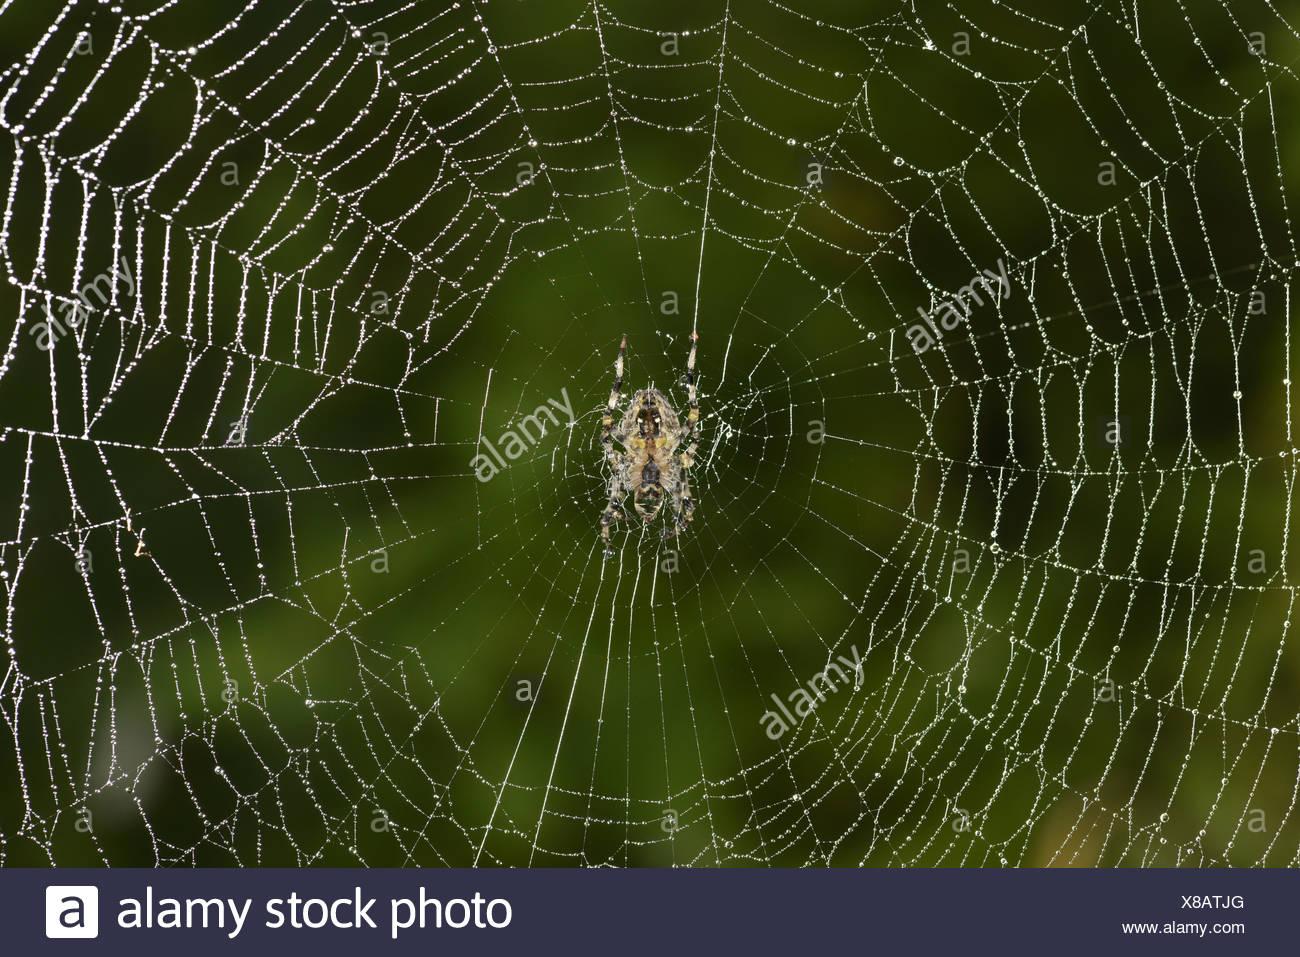 Garden Spider - Araneus diadematus - Stock Image